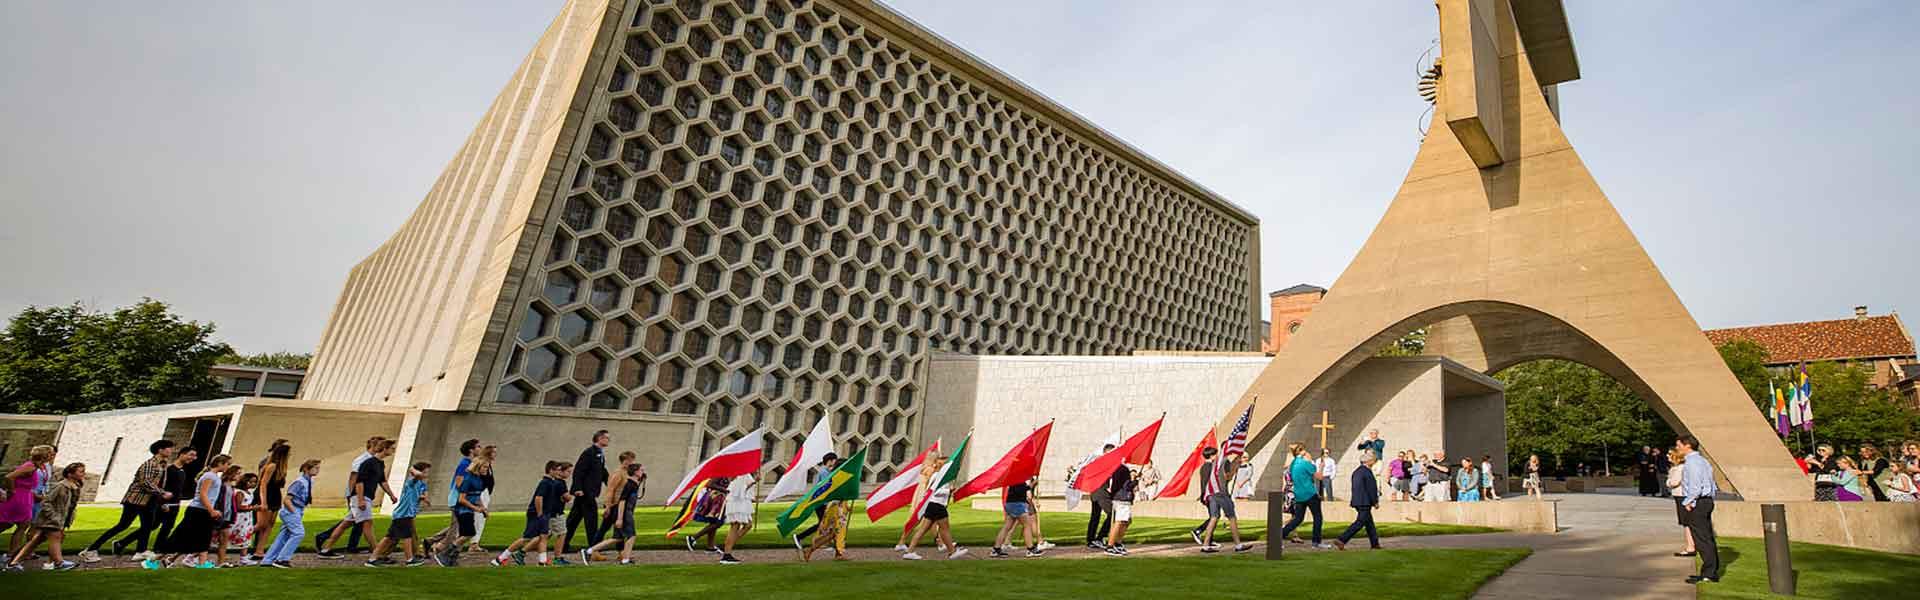 Students holding flags walking across campus at Saint John's Preparatory School